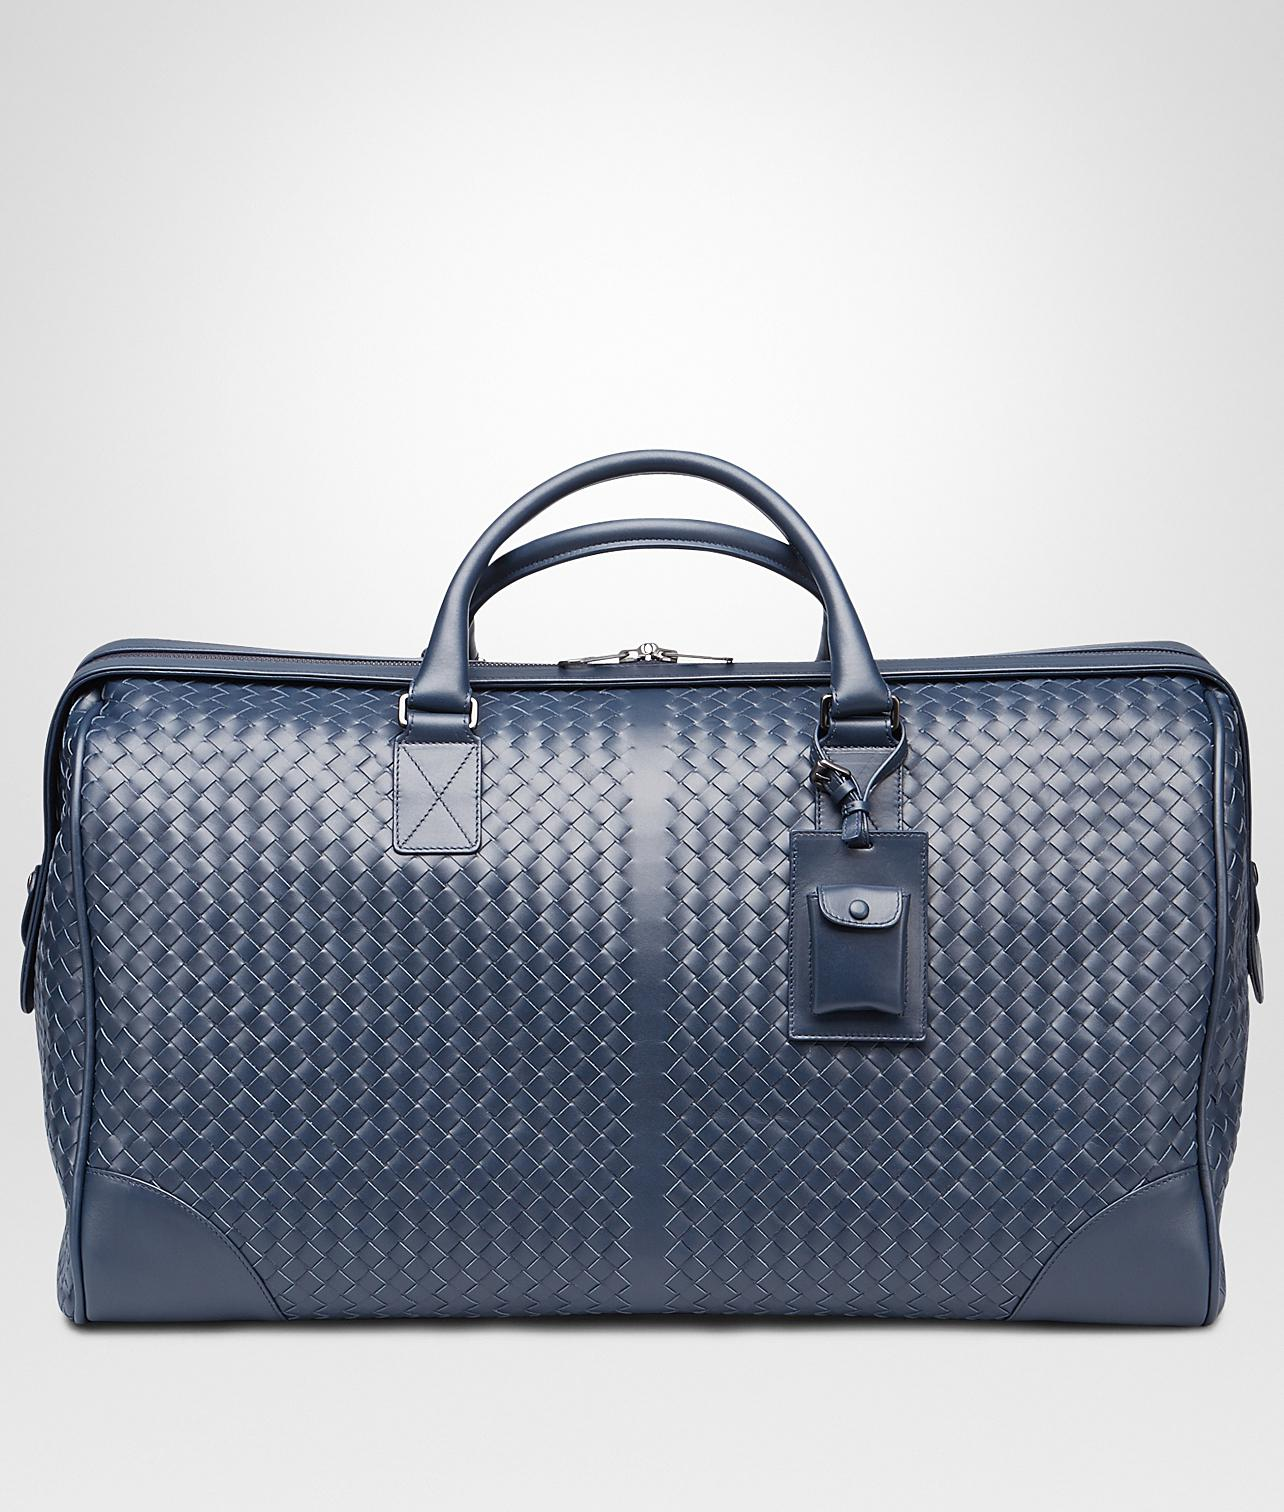 c6d263b501 Bottega Veneta Large Duffel Bag In Light Tourmaline Intrecciato Vn ...